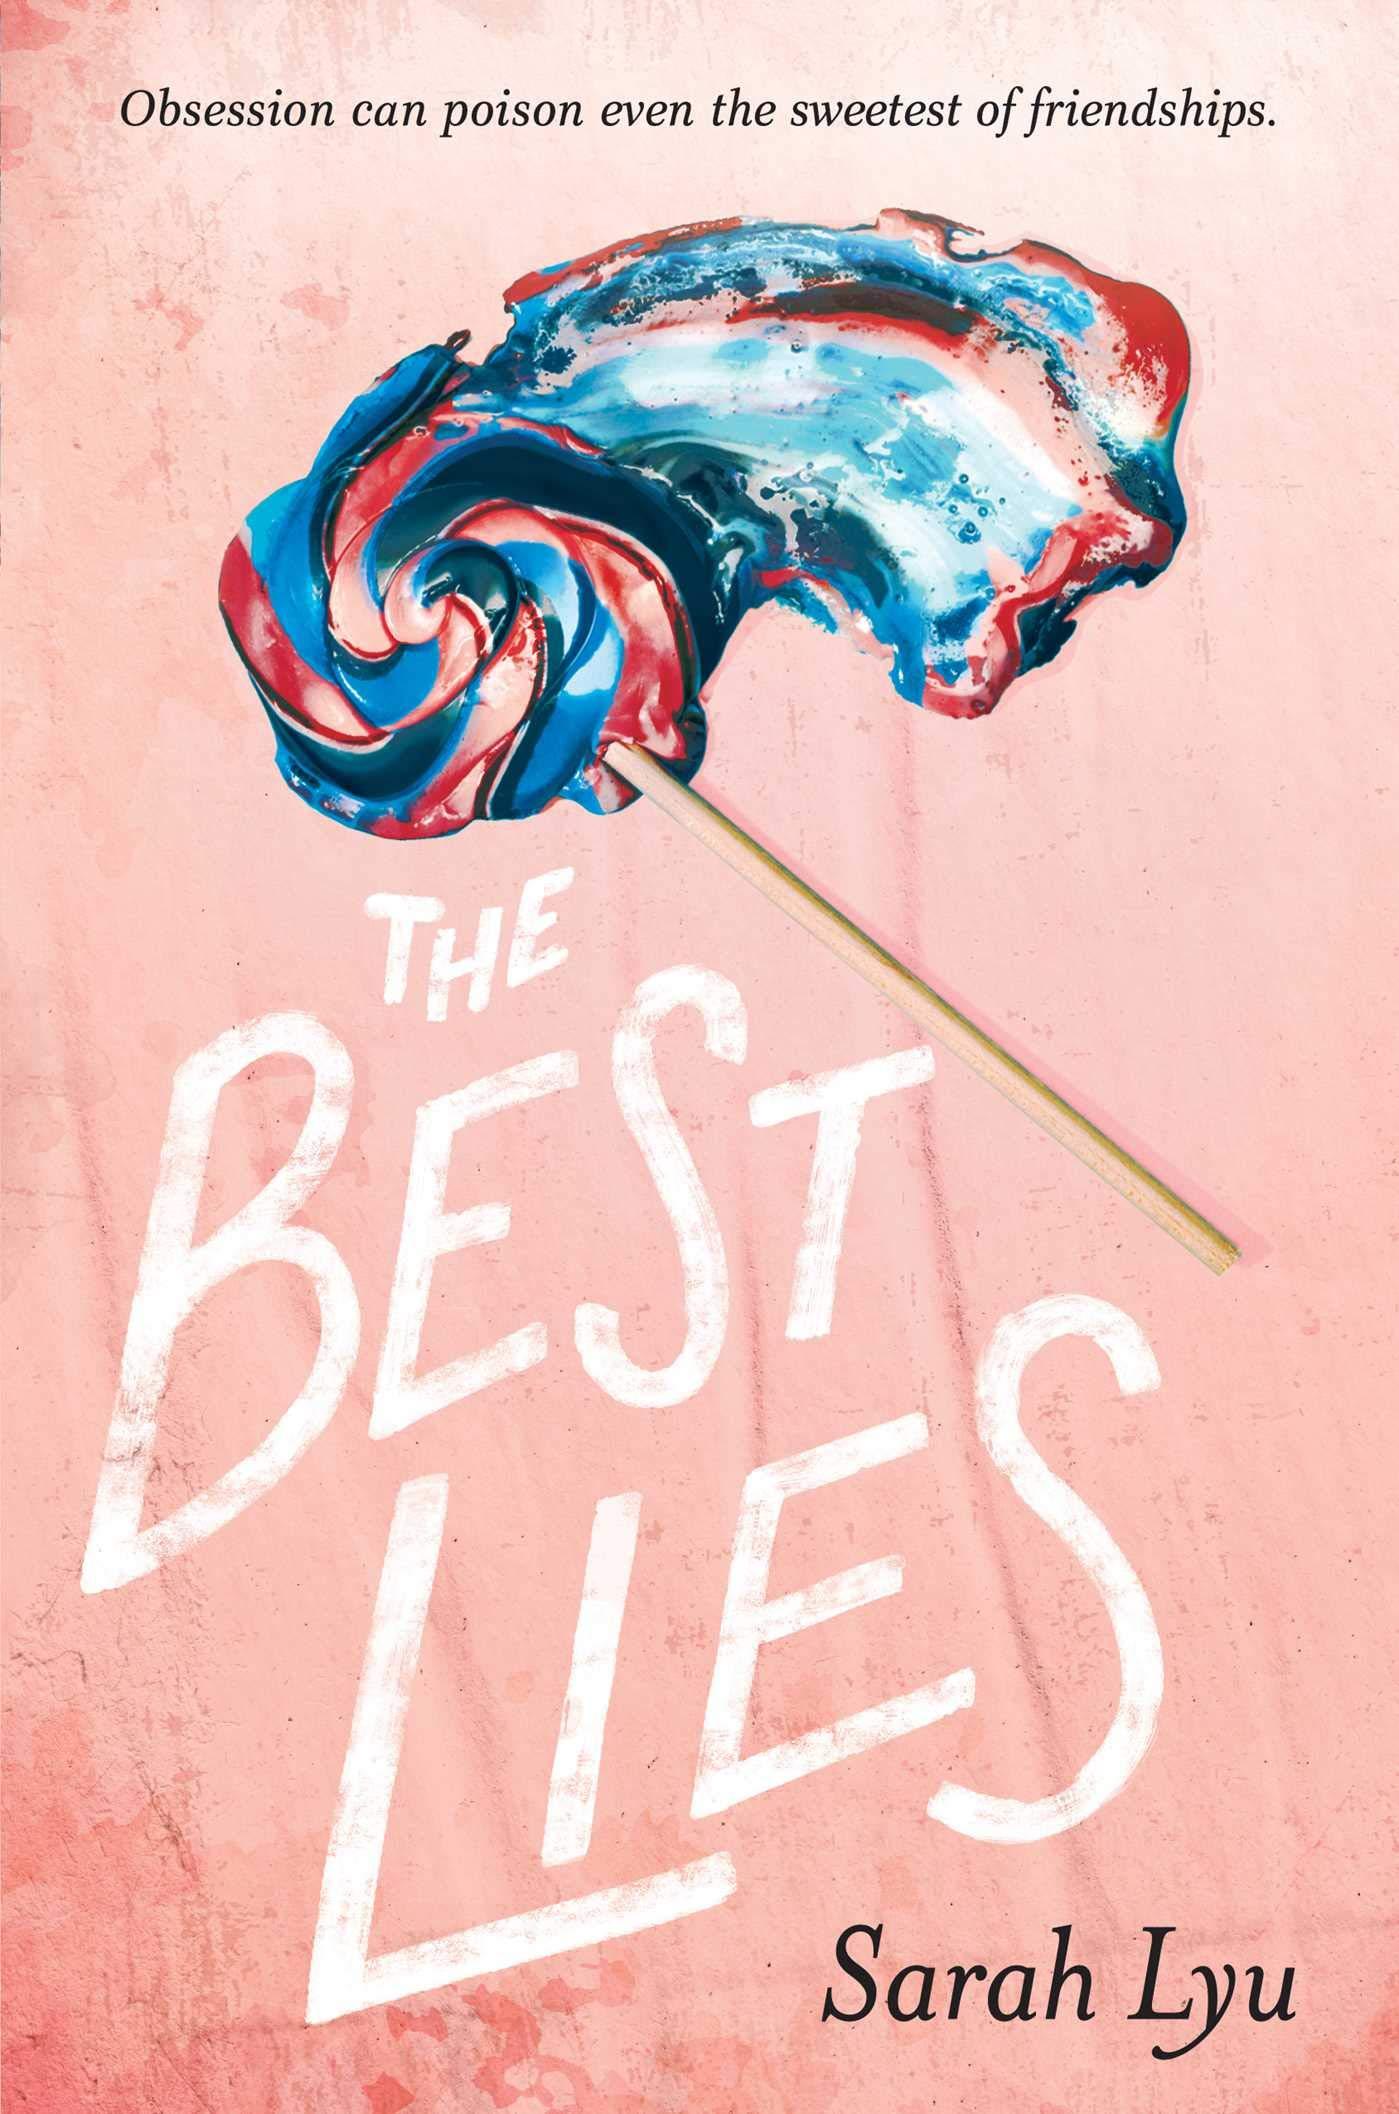 Amazon.com: The Best Lies (9781481498838): Lyu, Sarah: Books